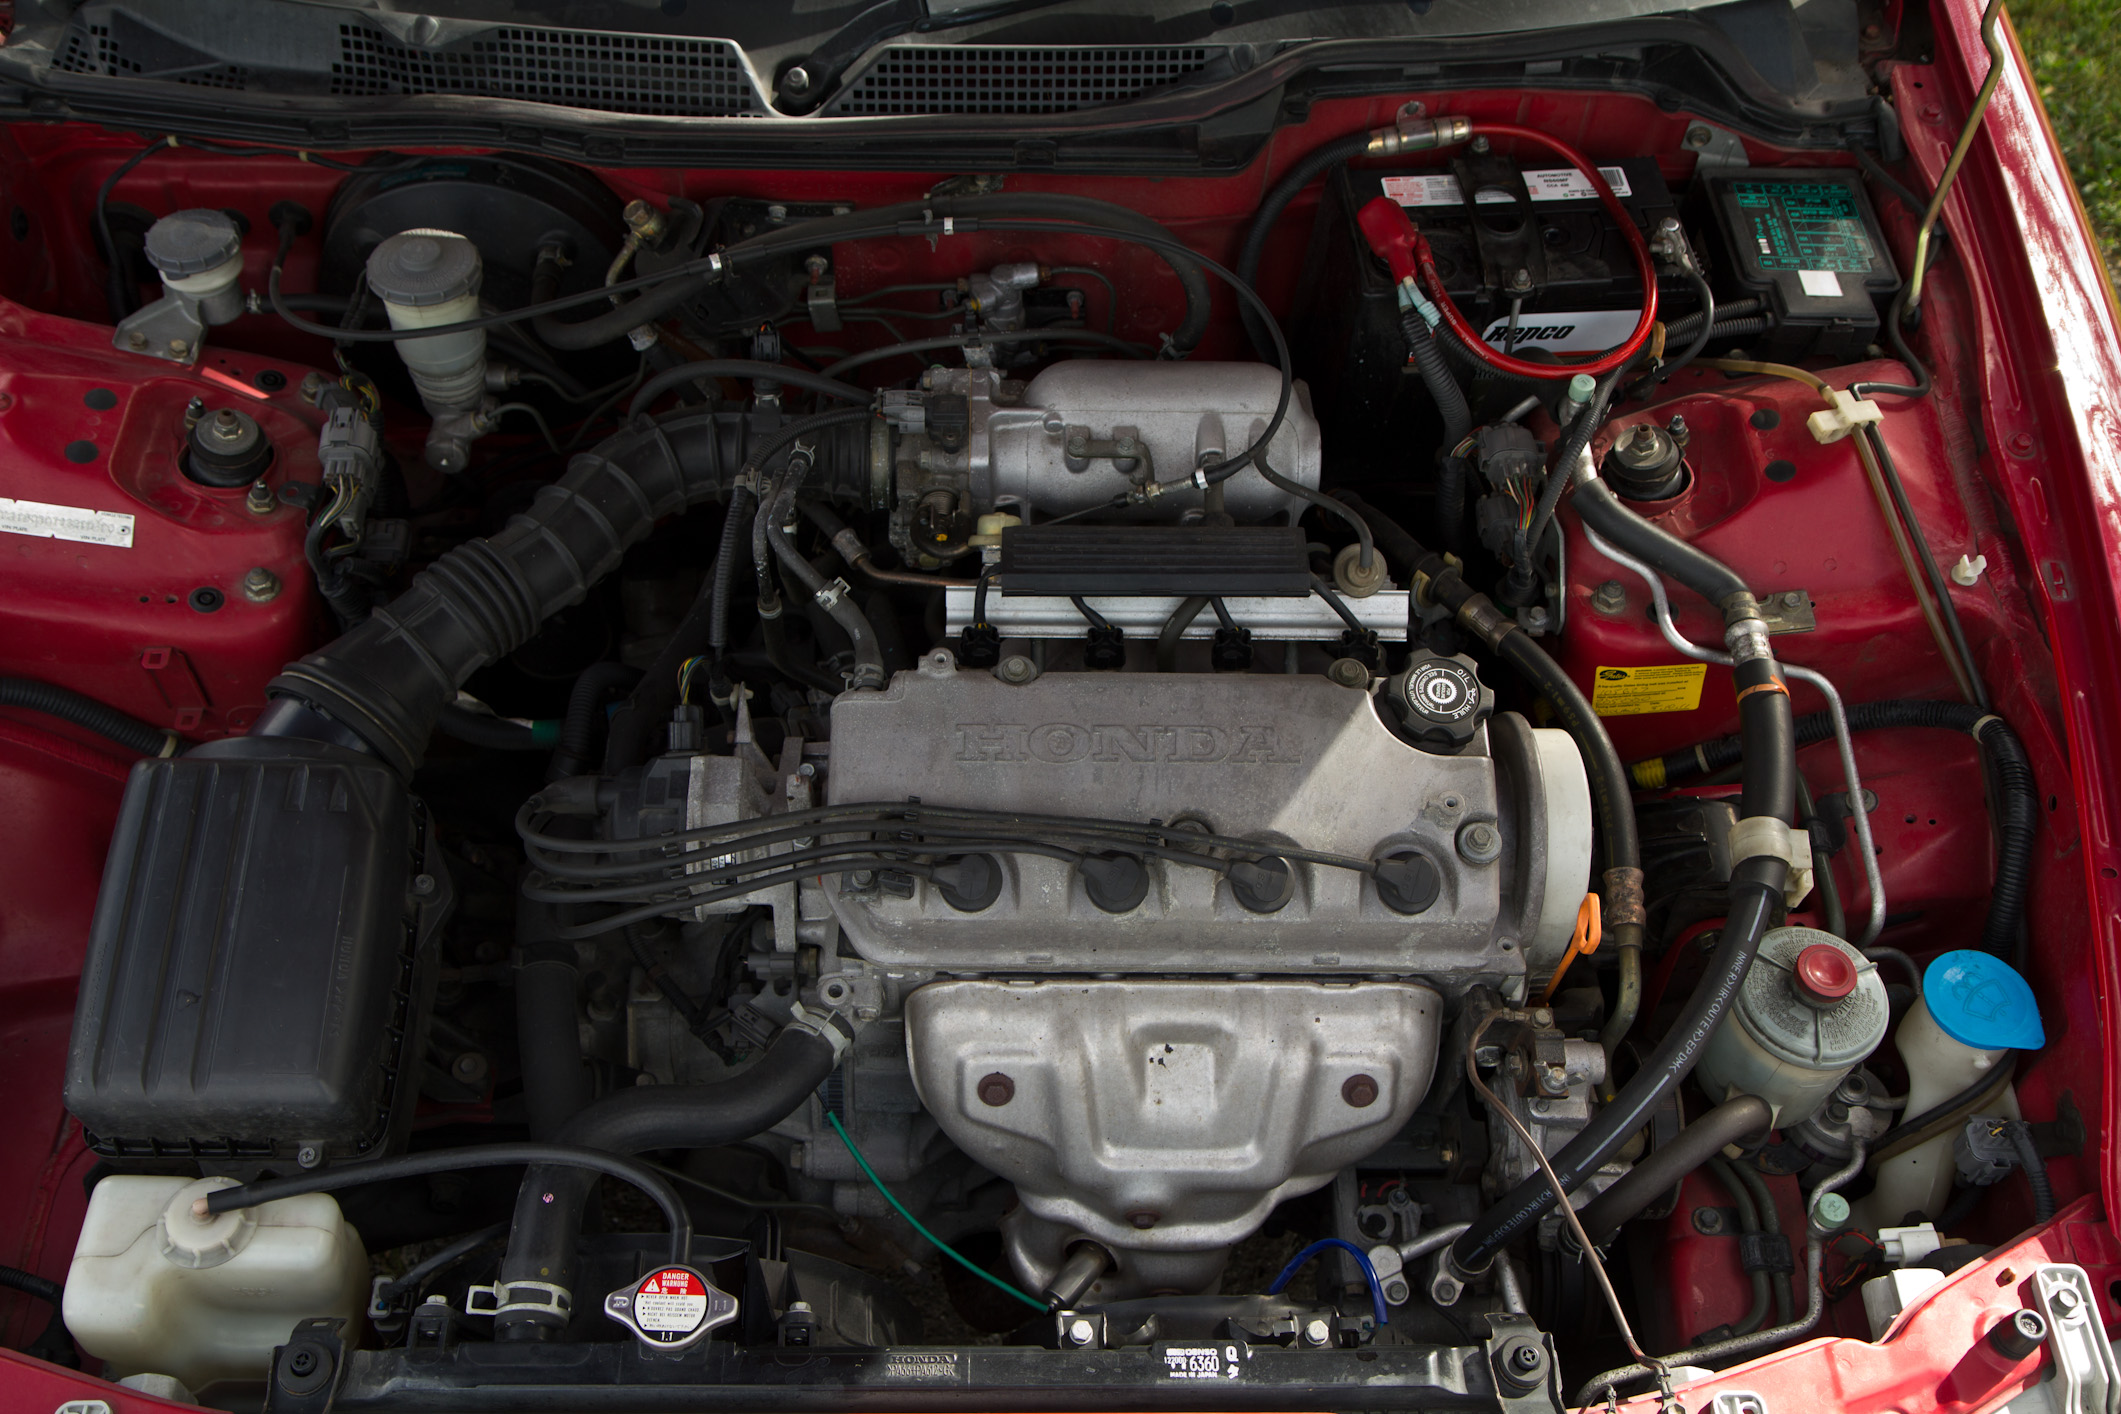 Honda Civic Timing Belt Marks On 93 Honda Accord Timing Mark Diagram